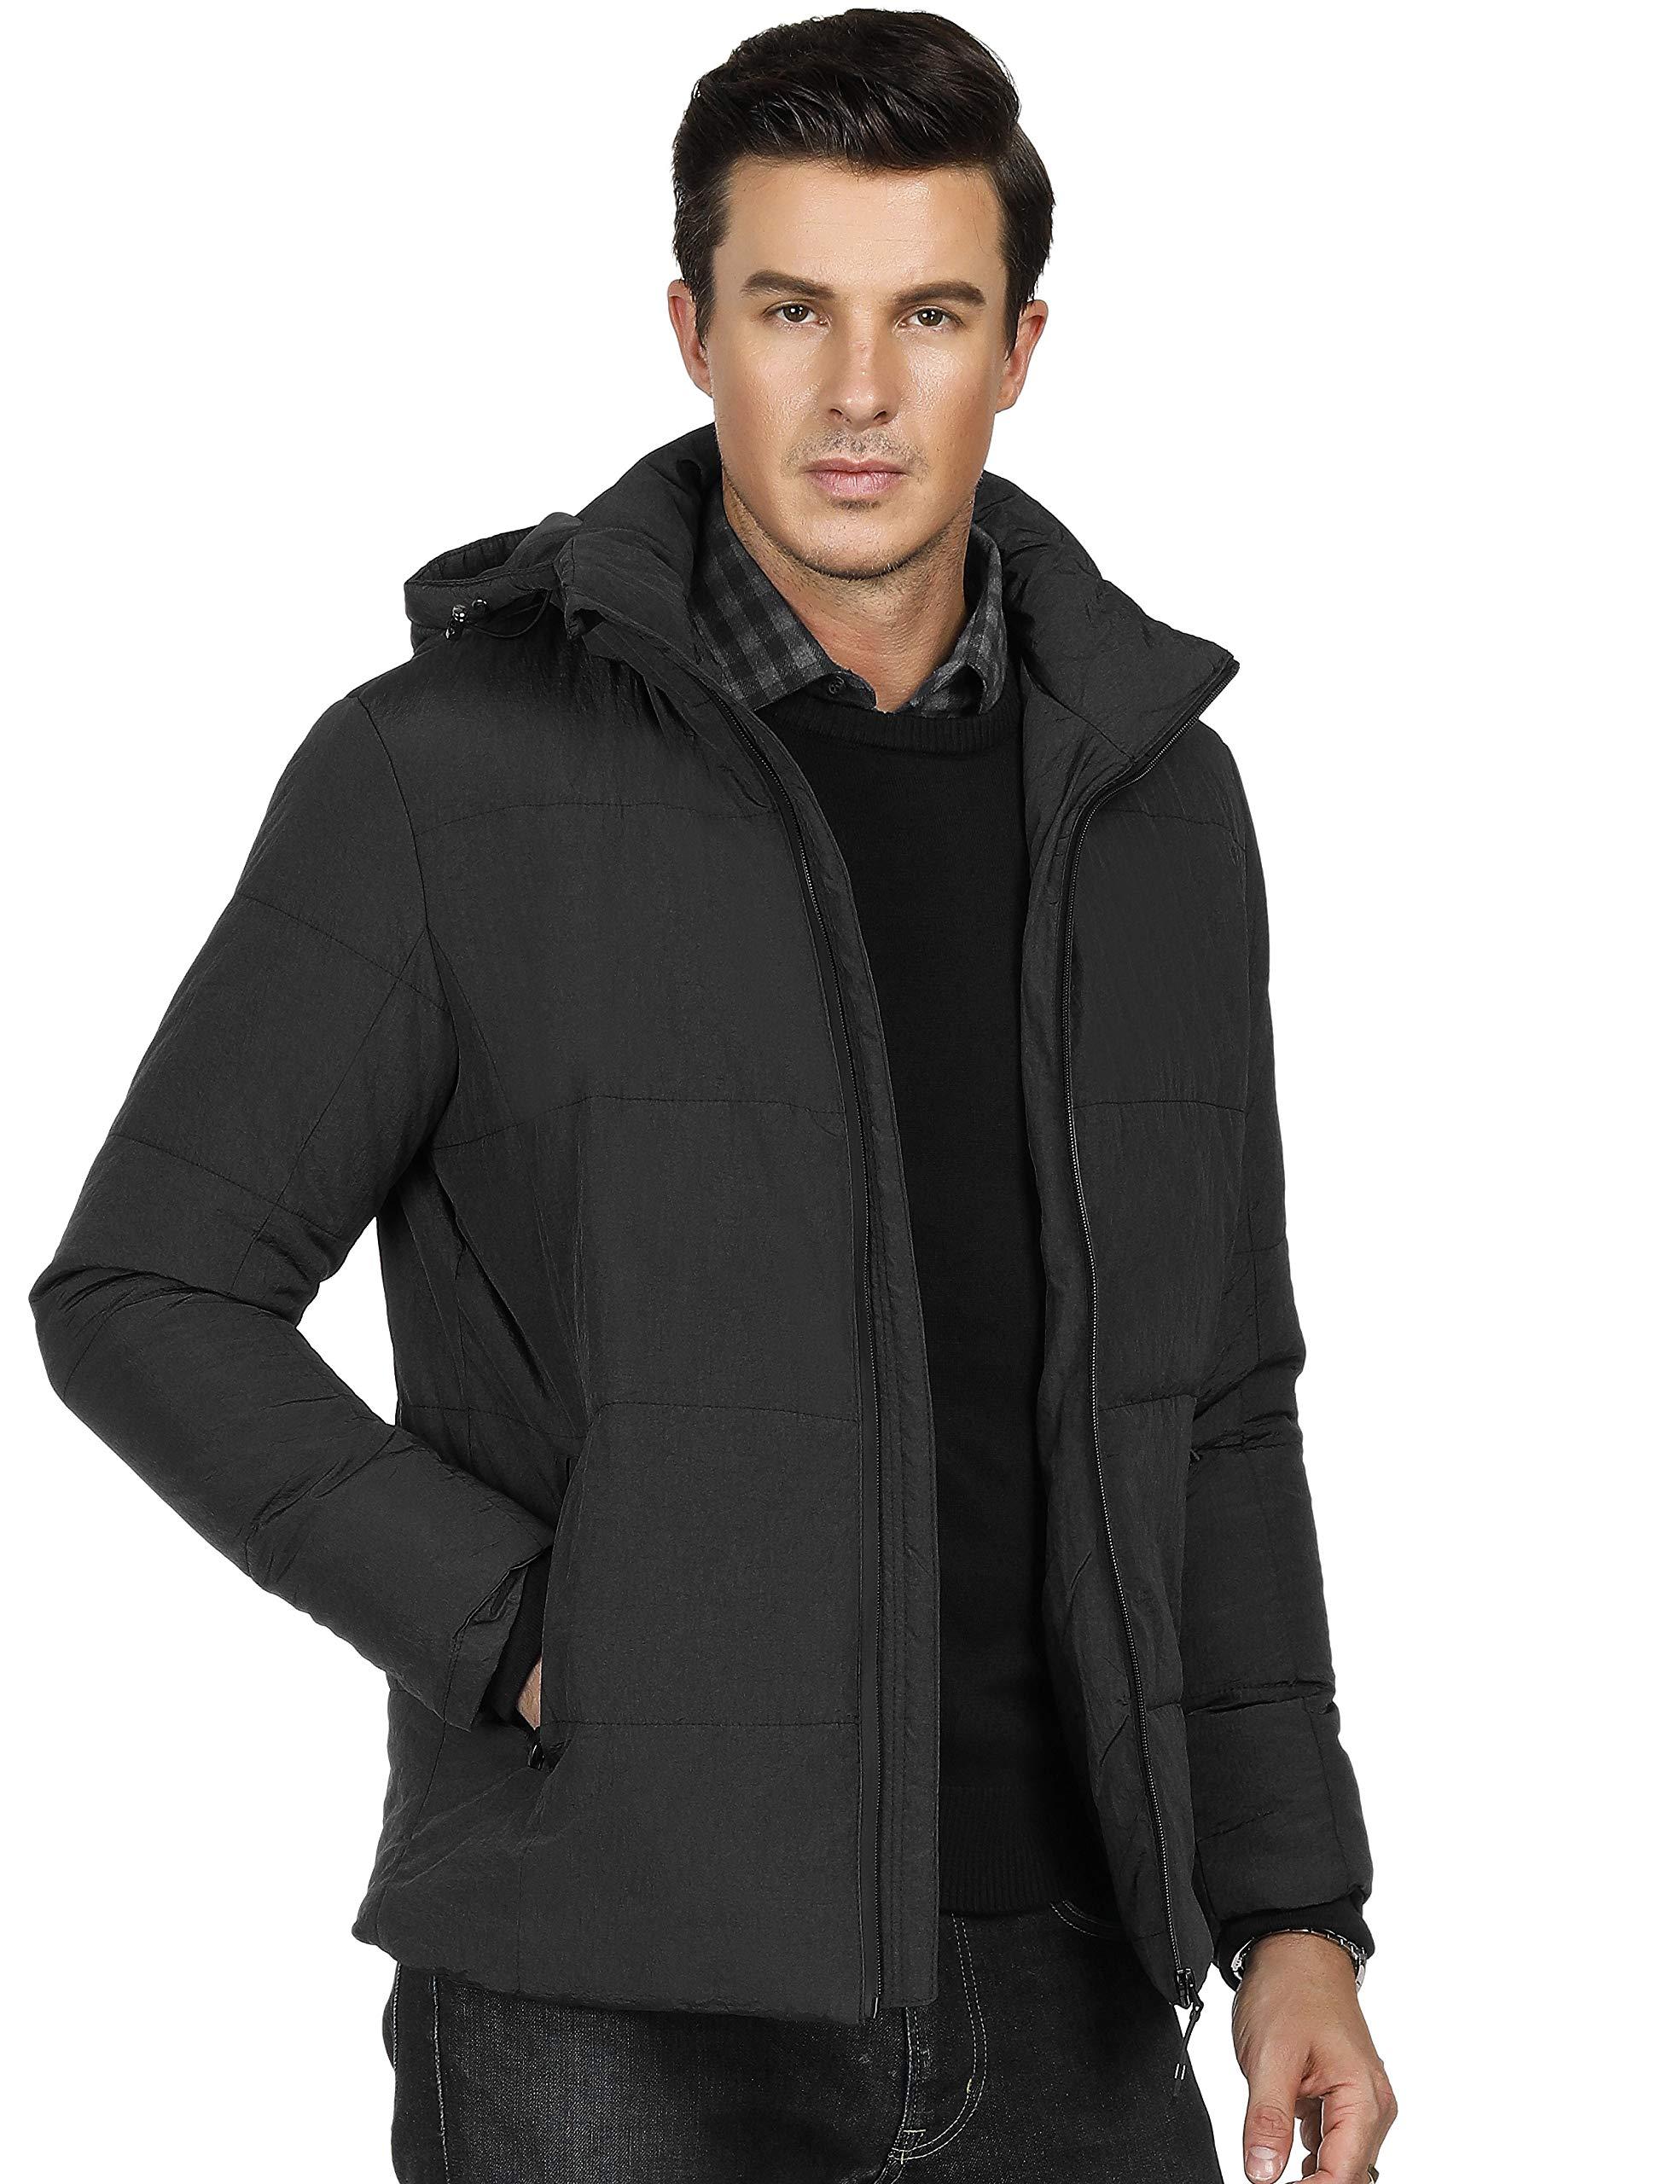 PAUL JONES Men's Classic Thermal Puffer Parka Jacket Removable Hood